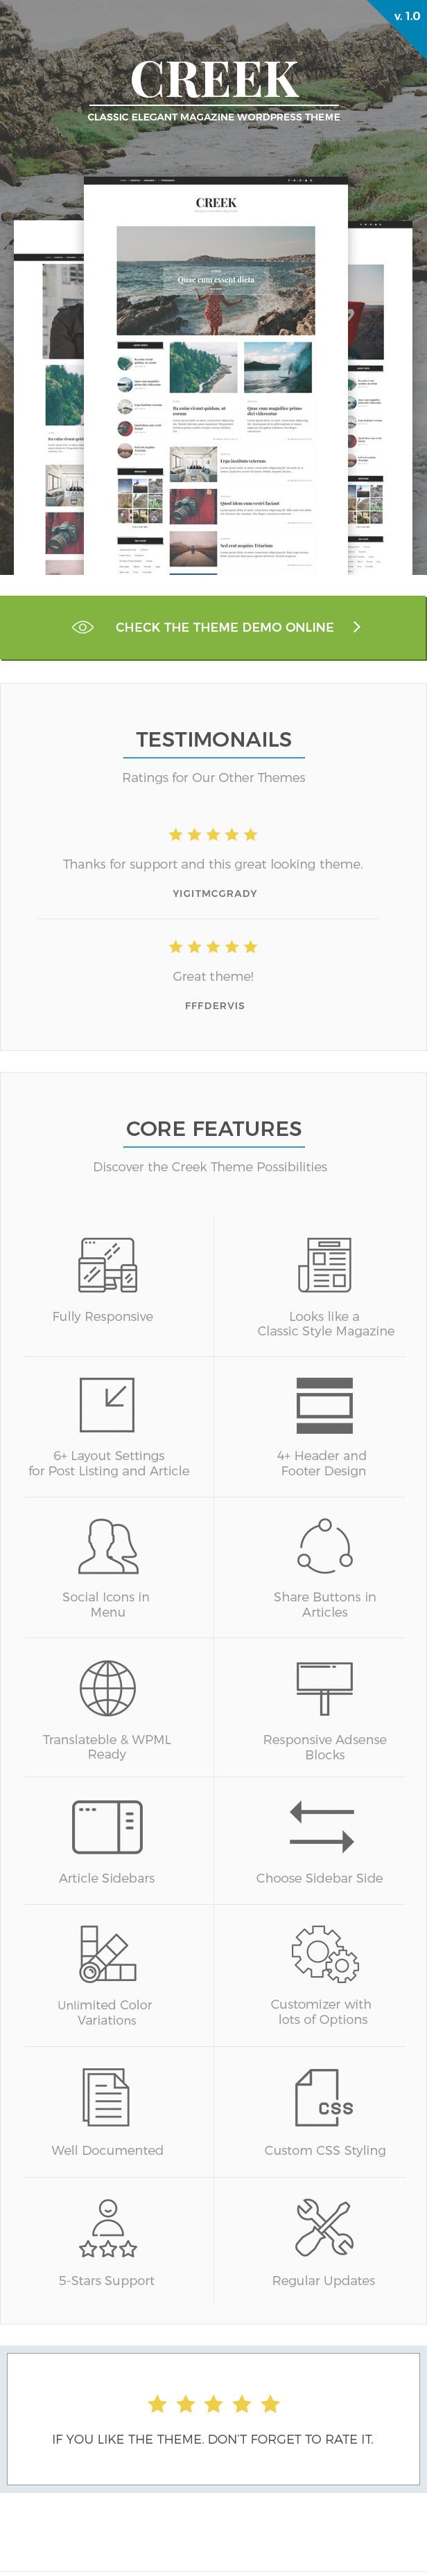 Creek - Classic Elegant Magazine WordPress Theme - 1